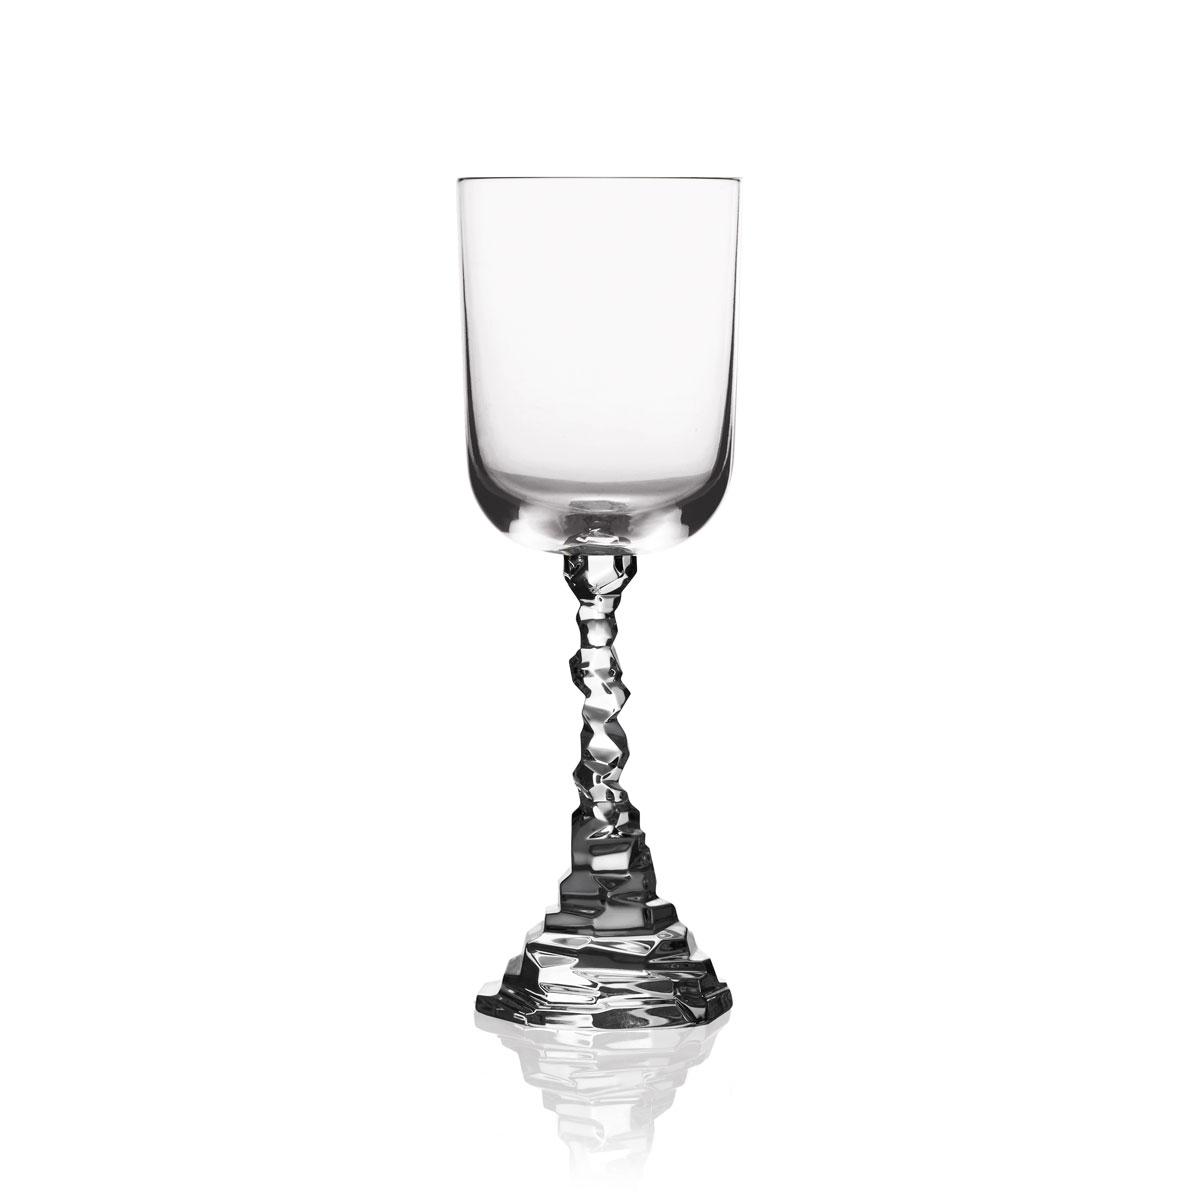 Michael Aram Rock Wine Glass, Single